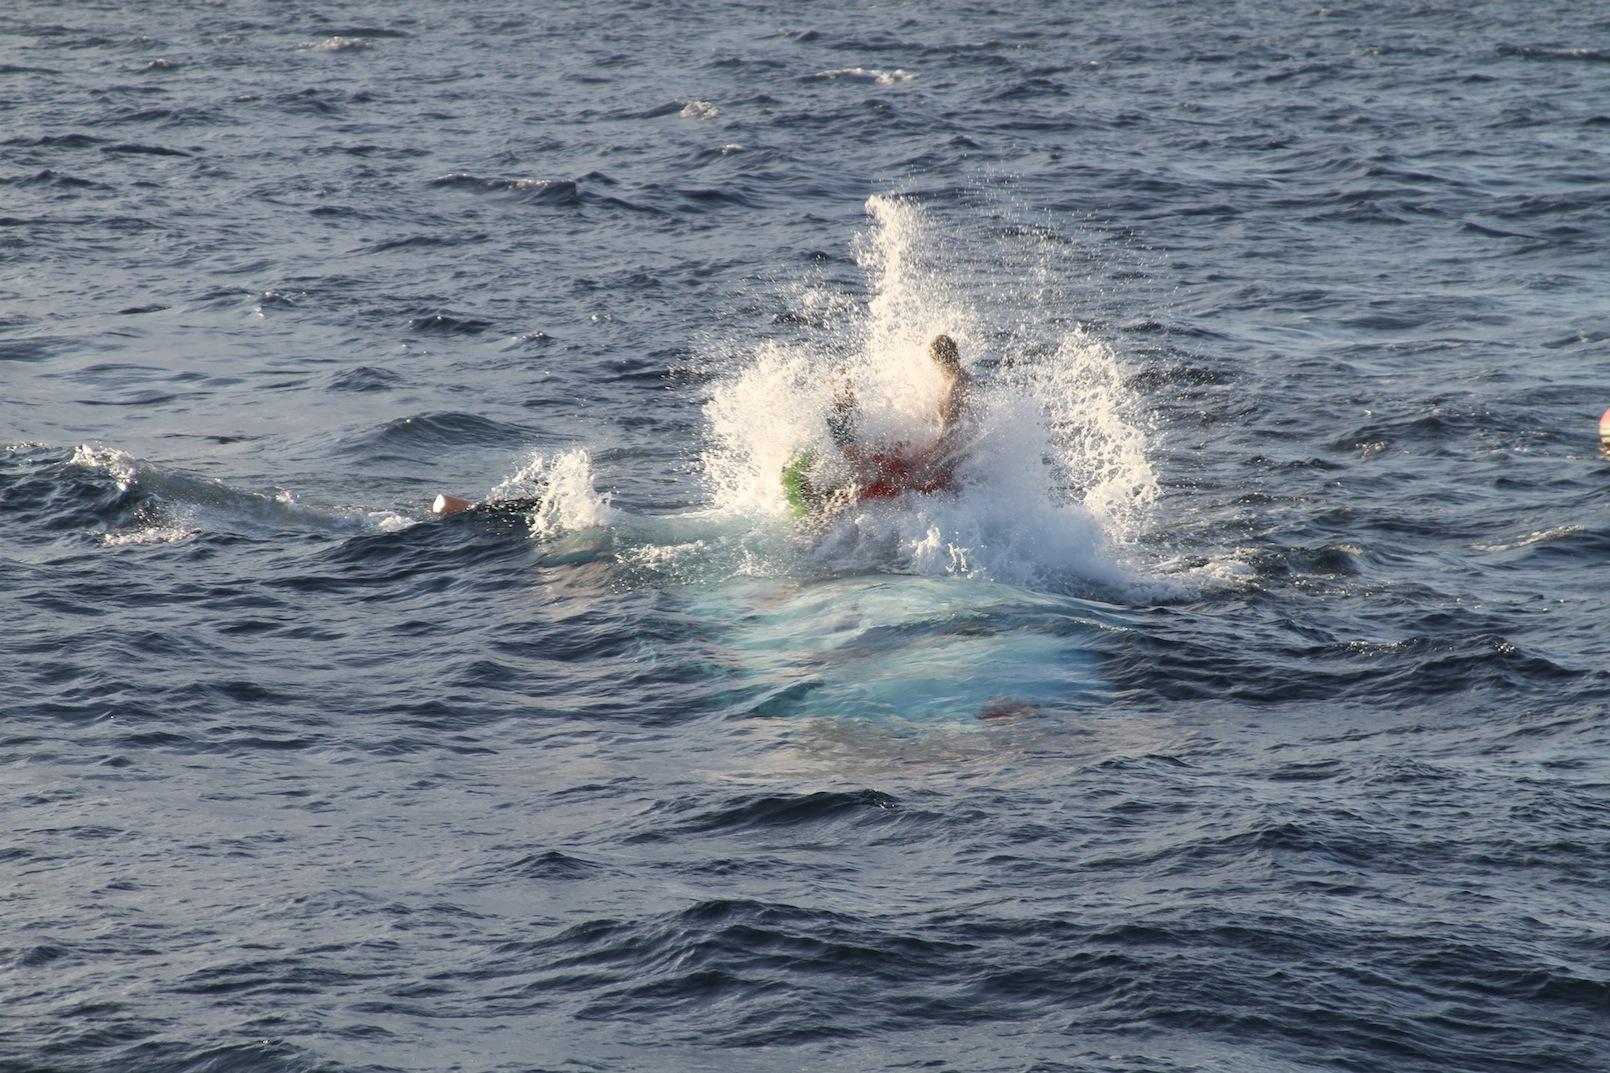 8-Alvin_rough_seas.JPG